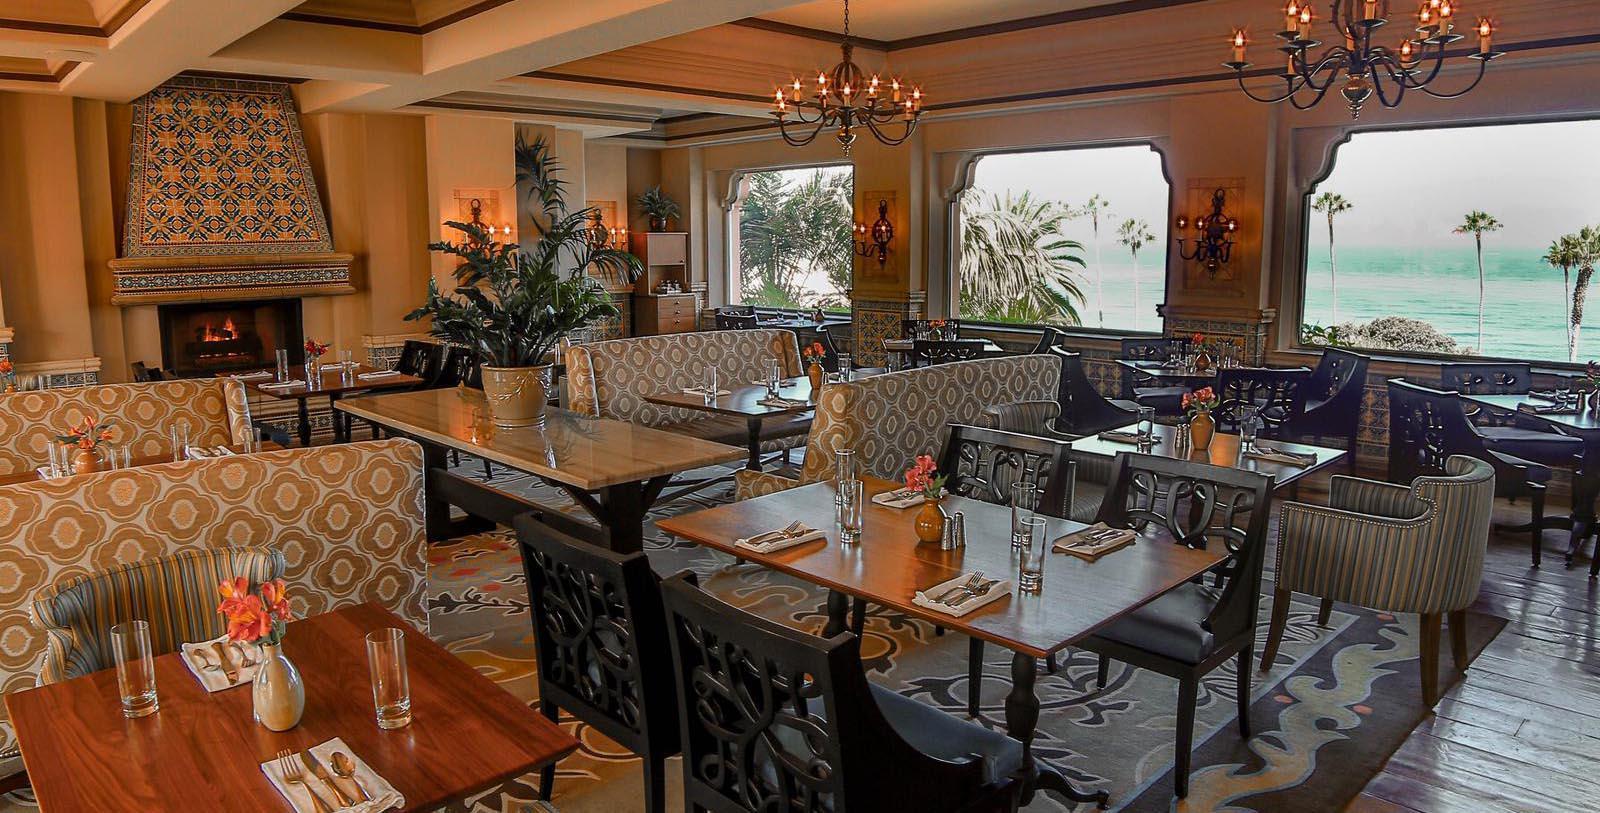 Image of La Sala Restaurant, La Valencia Hotel in La Jolla, Califronia, 1926, Member of Historic Hotels of America, Taste